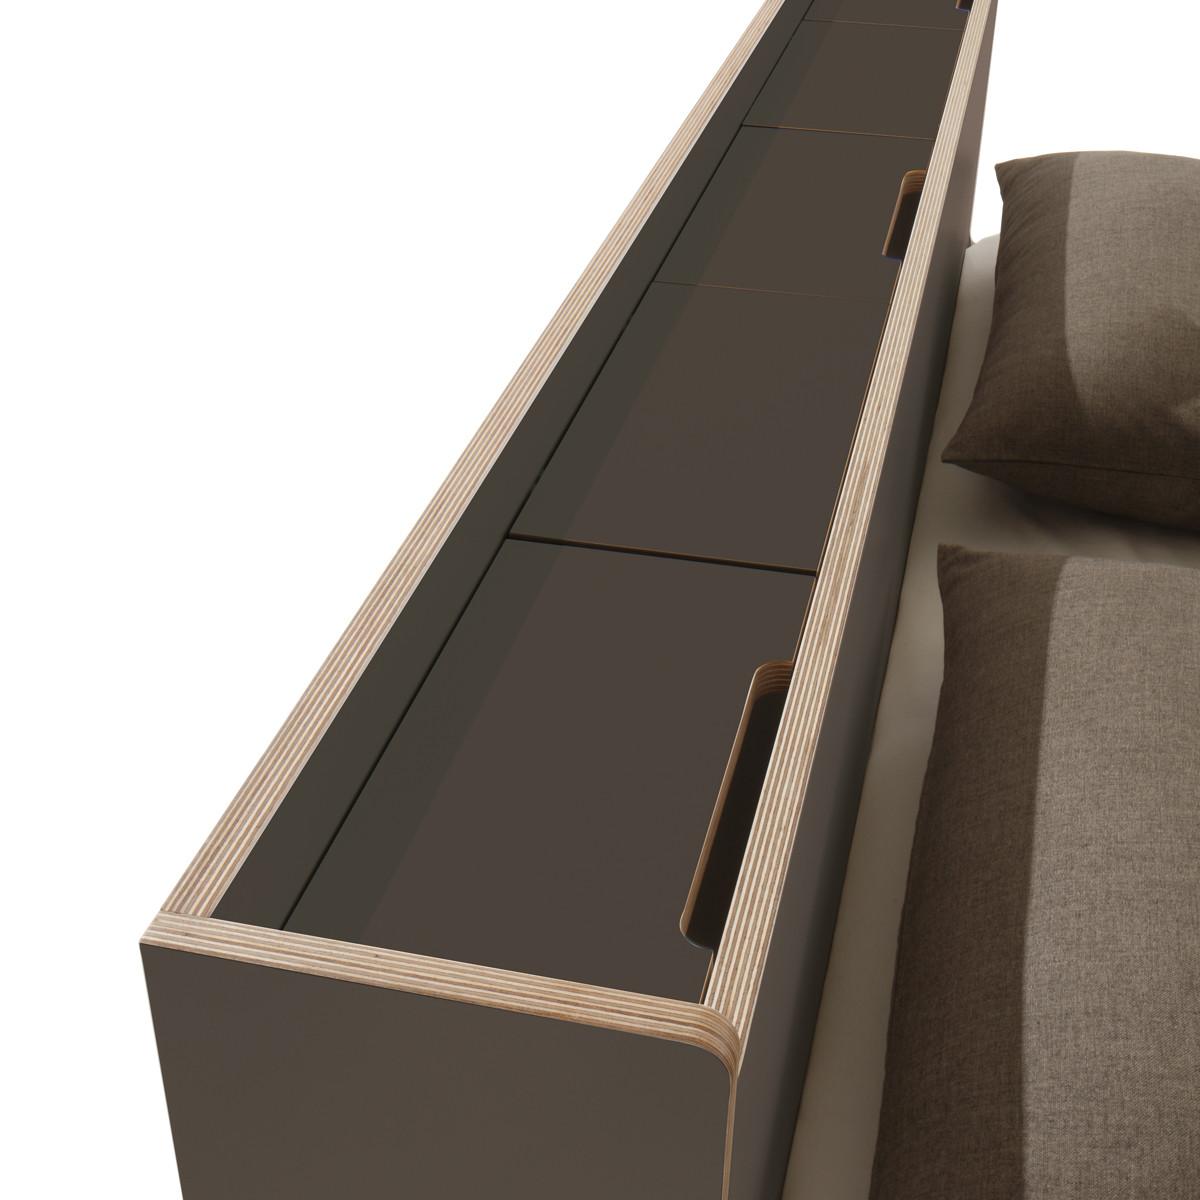 m ller m belwerkst tten nook doppelbett anthrazit casa de. Black Bedroom Furniture Sets. Home Design Ideas